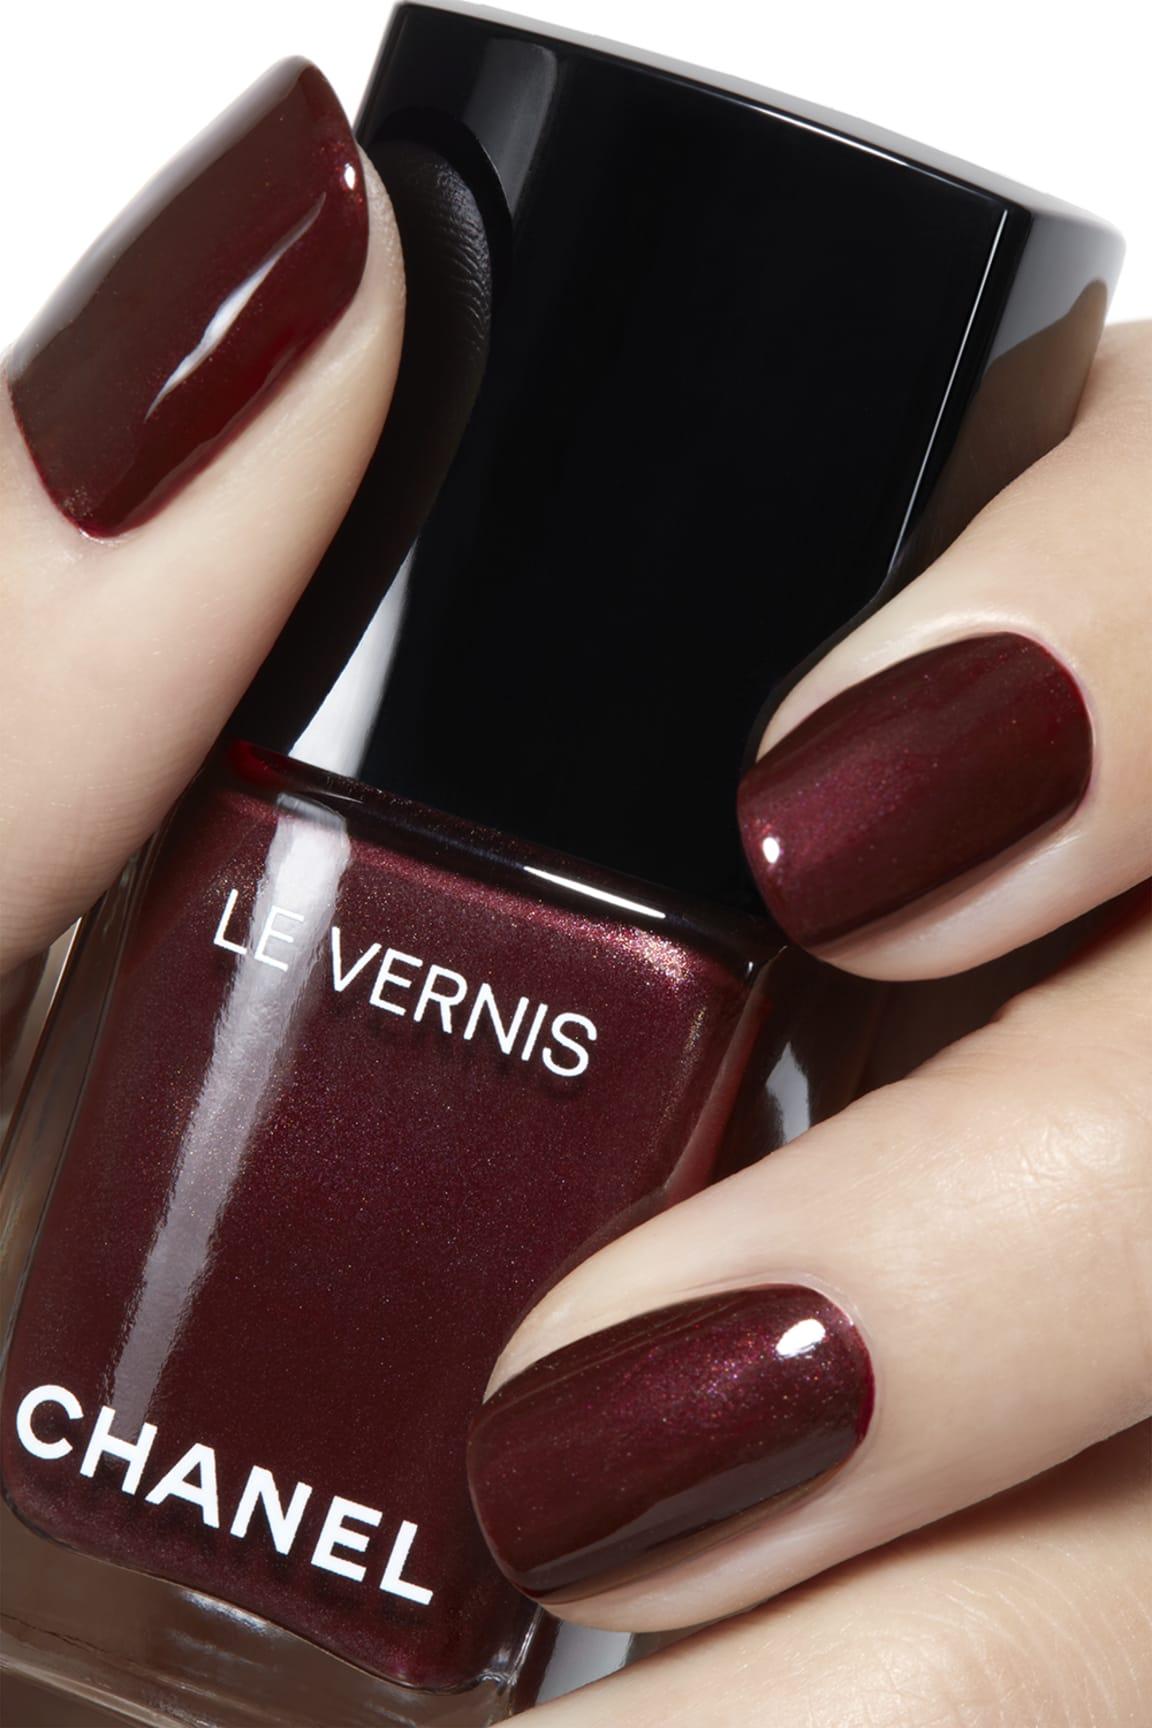 Application makeup visual 2 - LE VERNIS 18 - VAMP